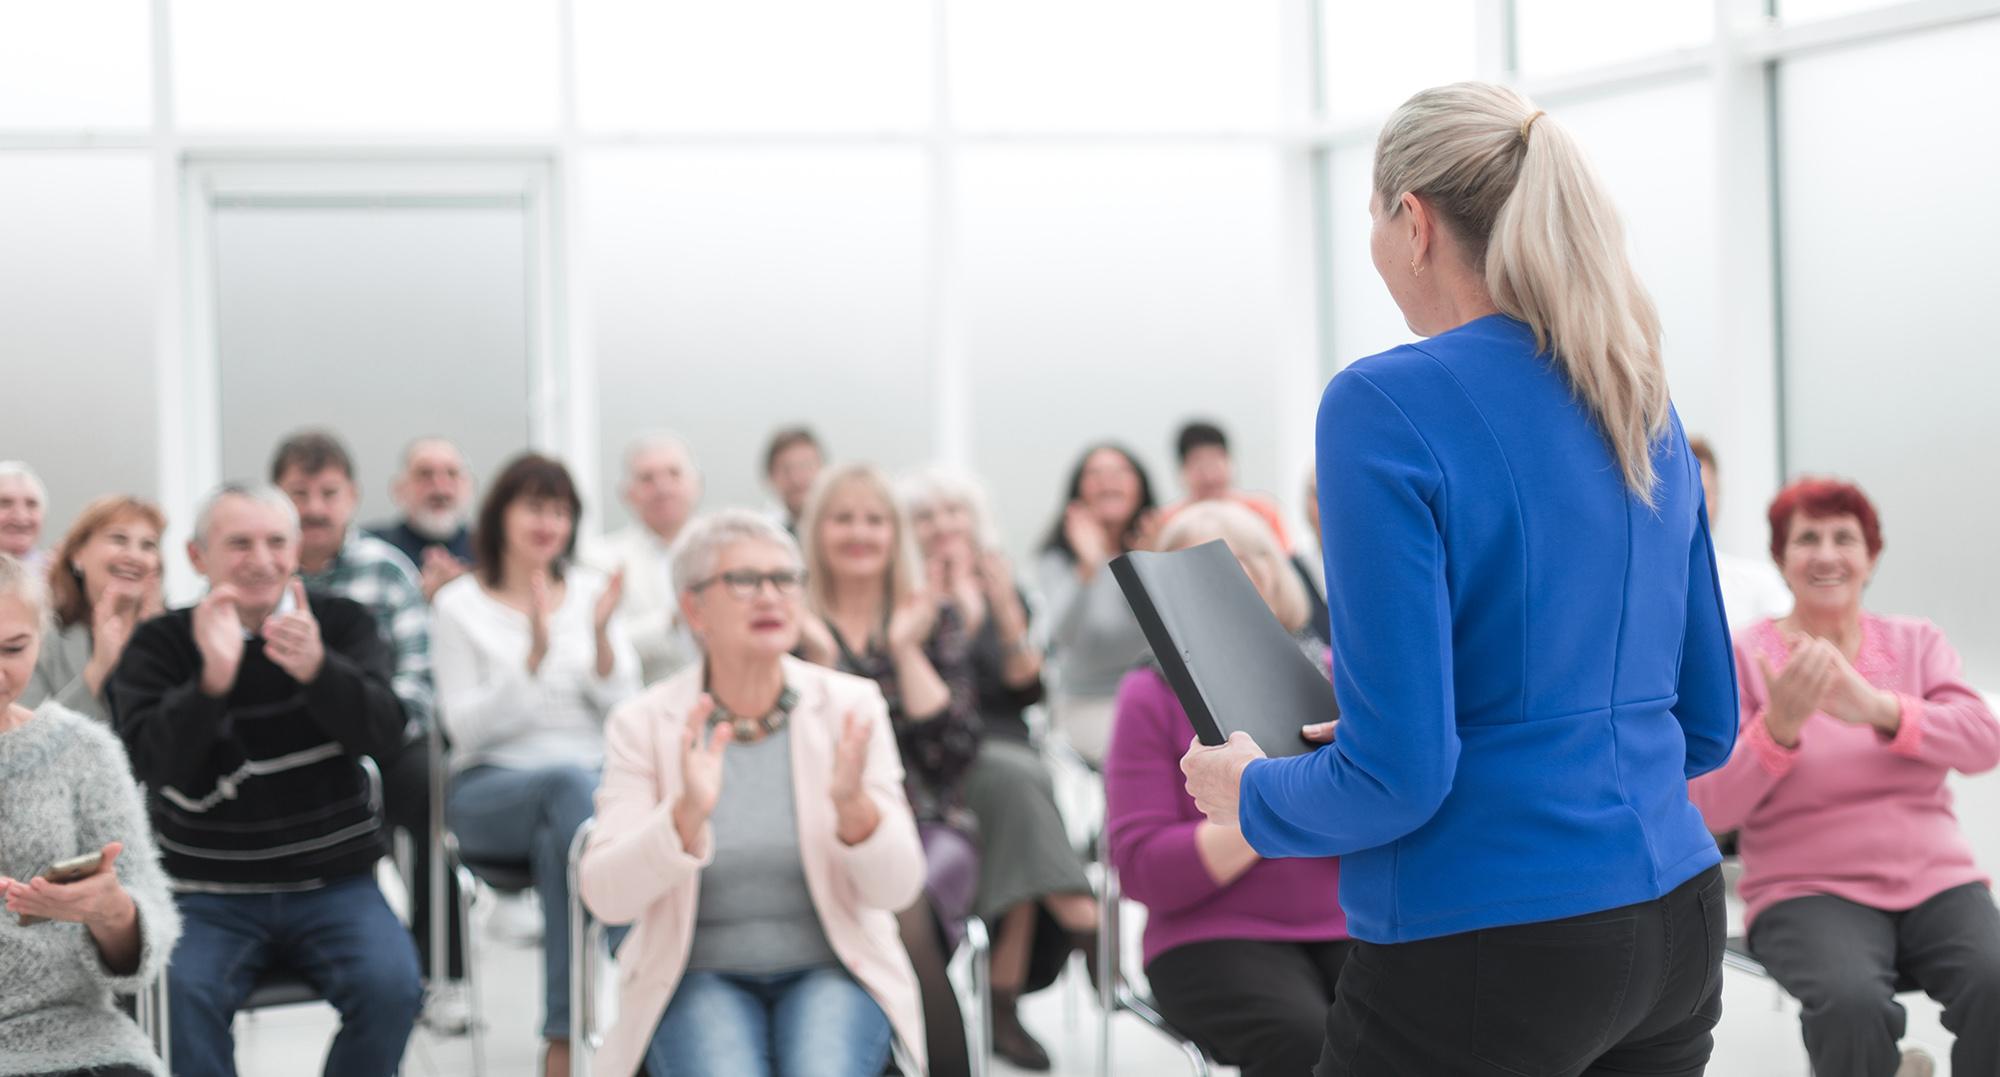 Foredrag foran en gruppe mennesker